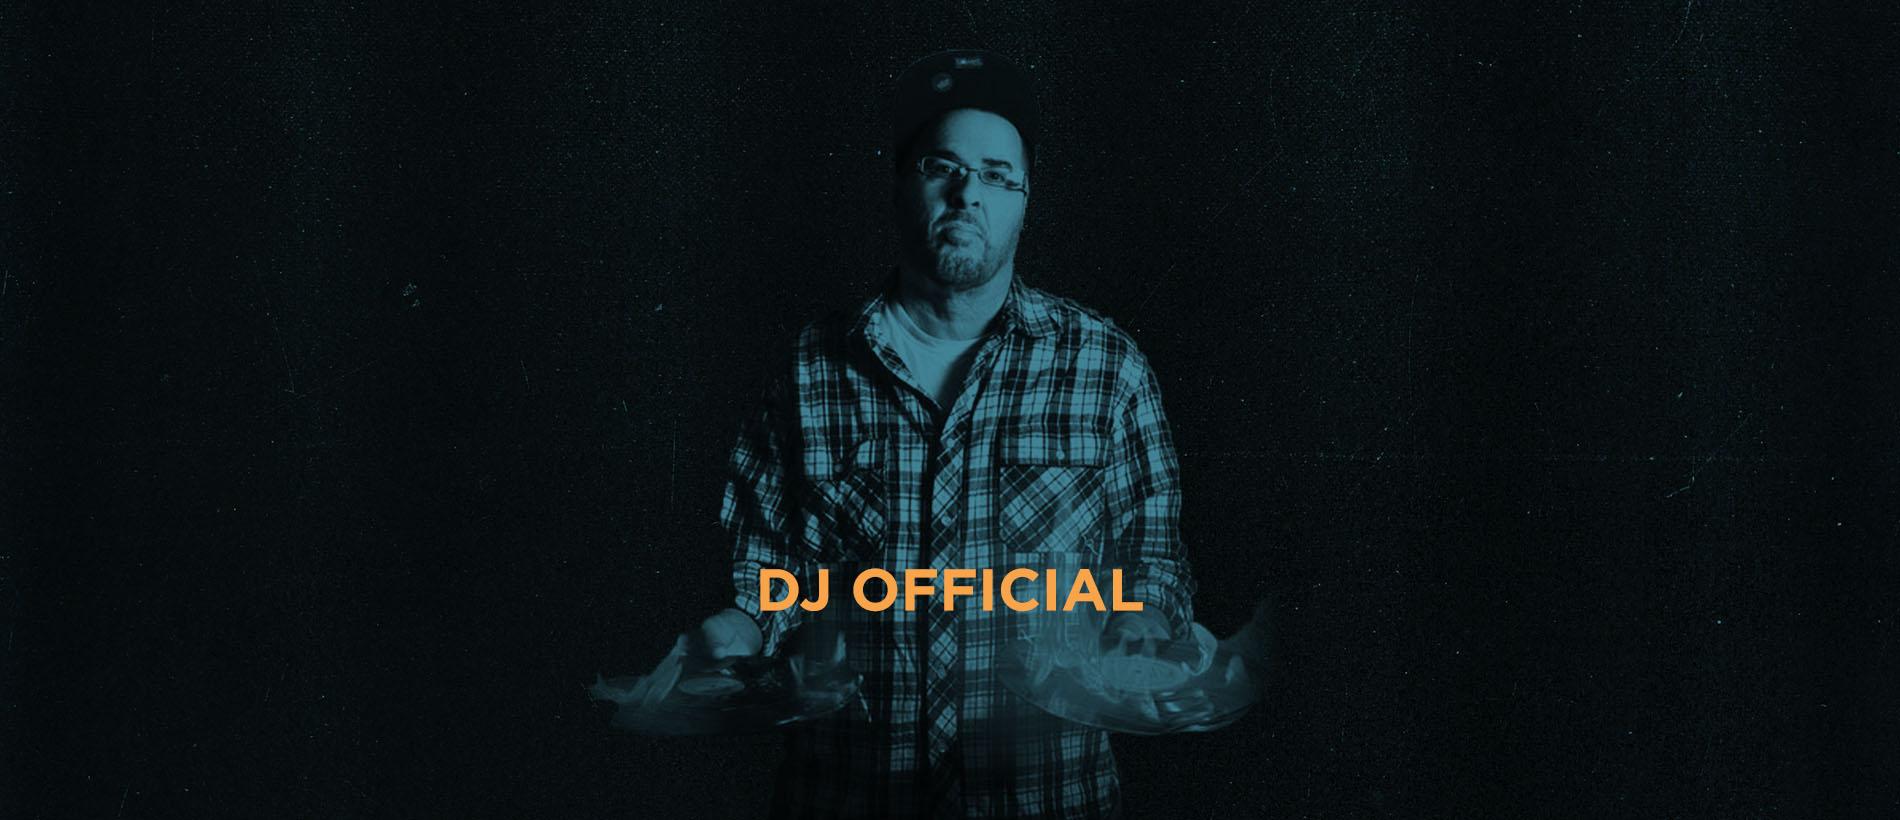 In Memory of DJ Official